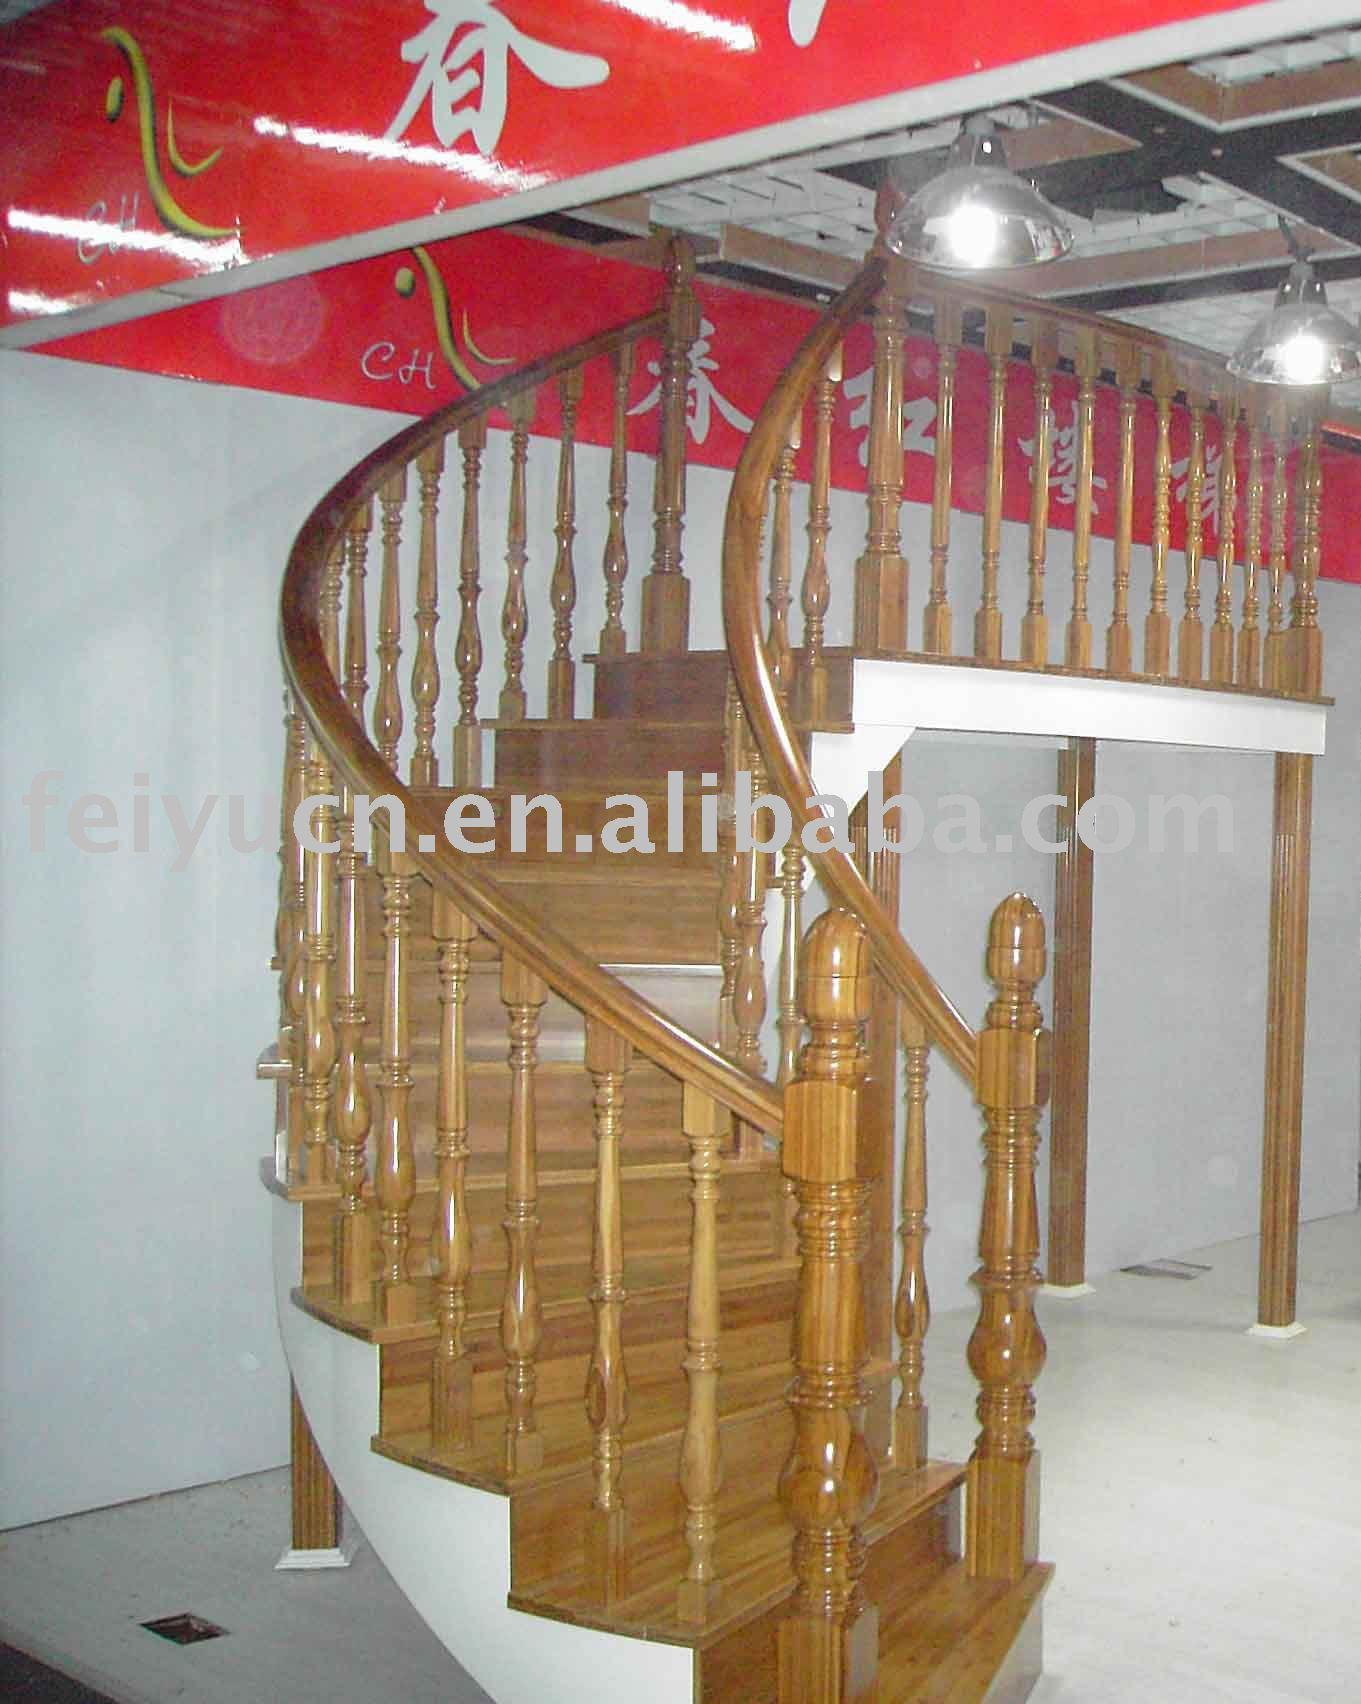 romano diseo simple escalera de bamb